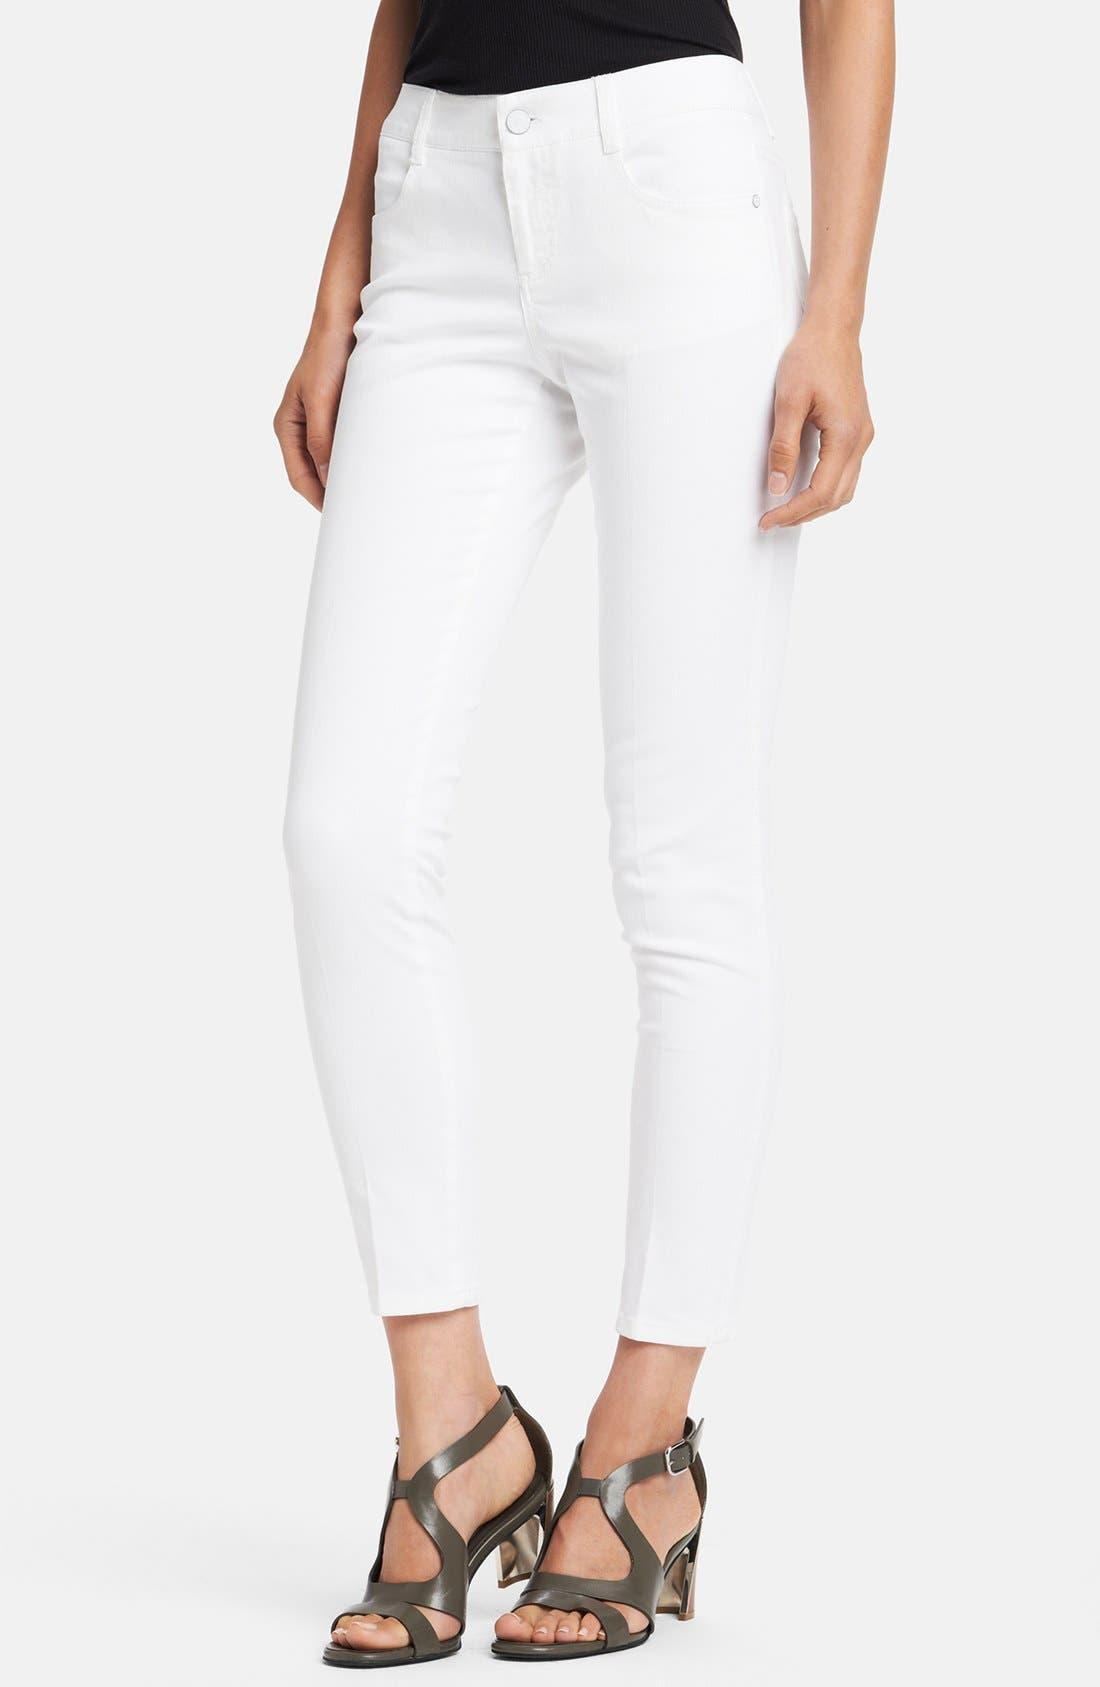 Main Image - Stella McCartney 'Simone' Skinny Ankle Grazer Jeans